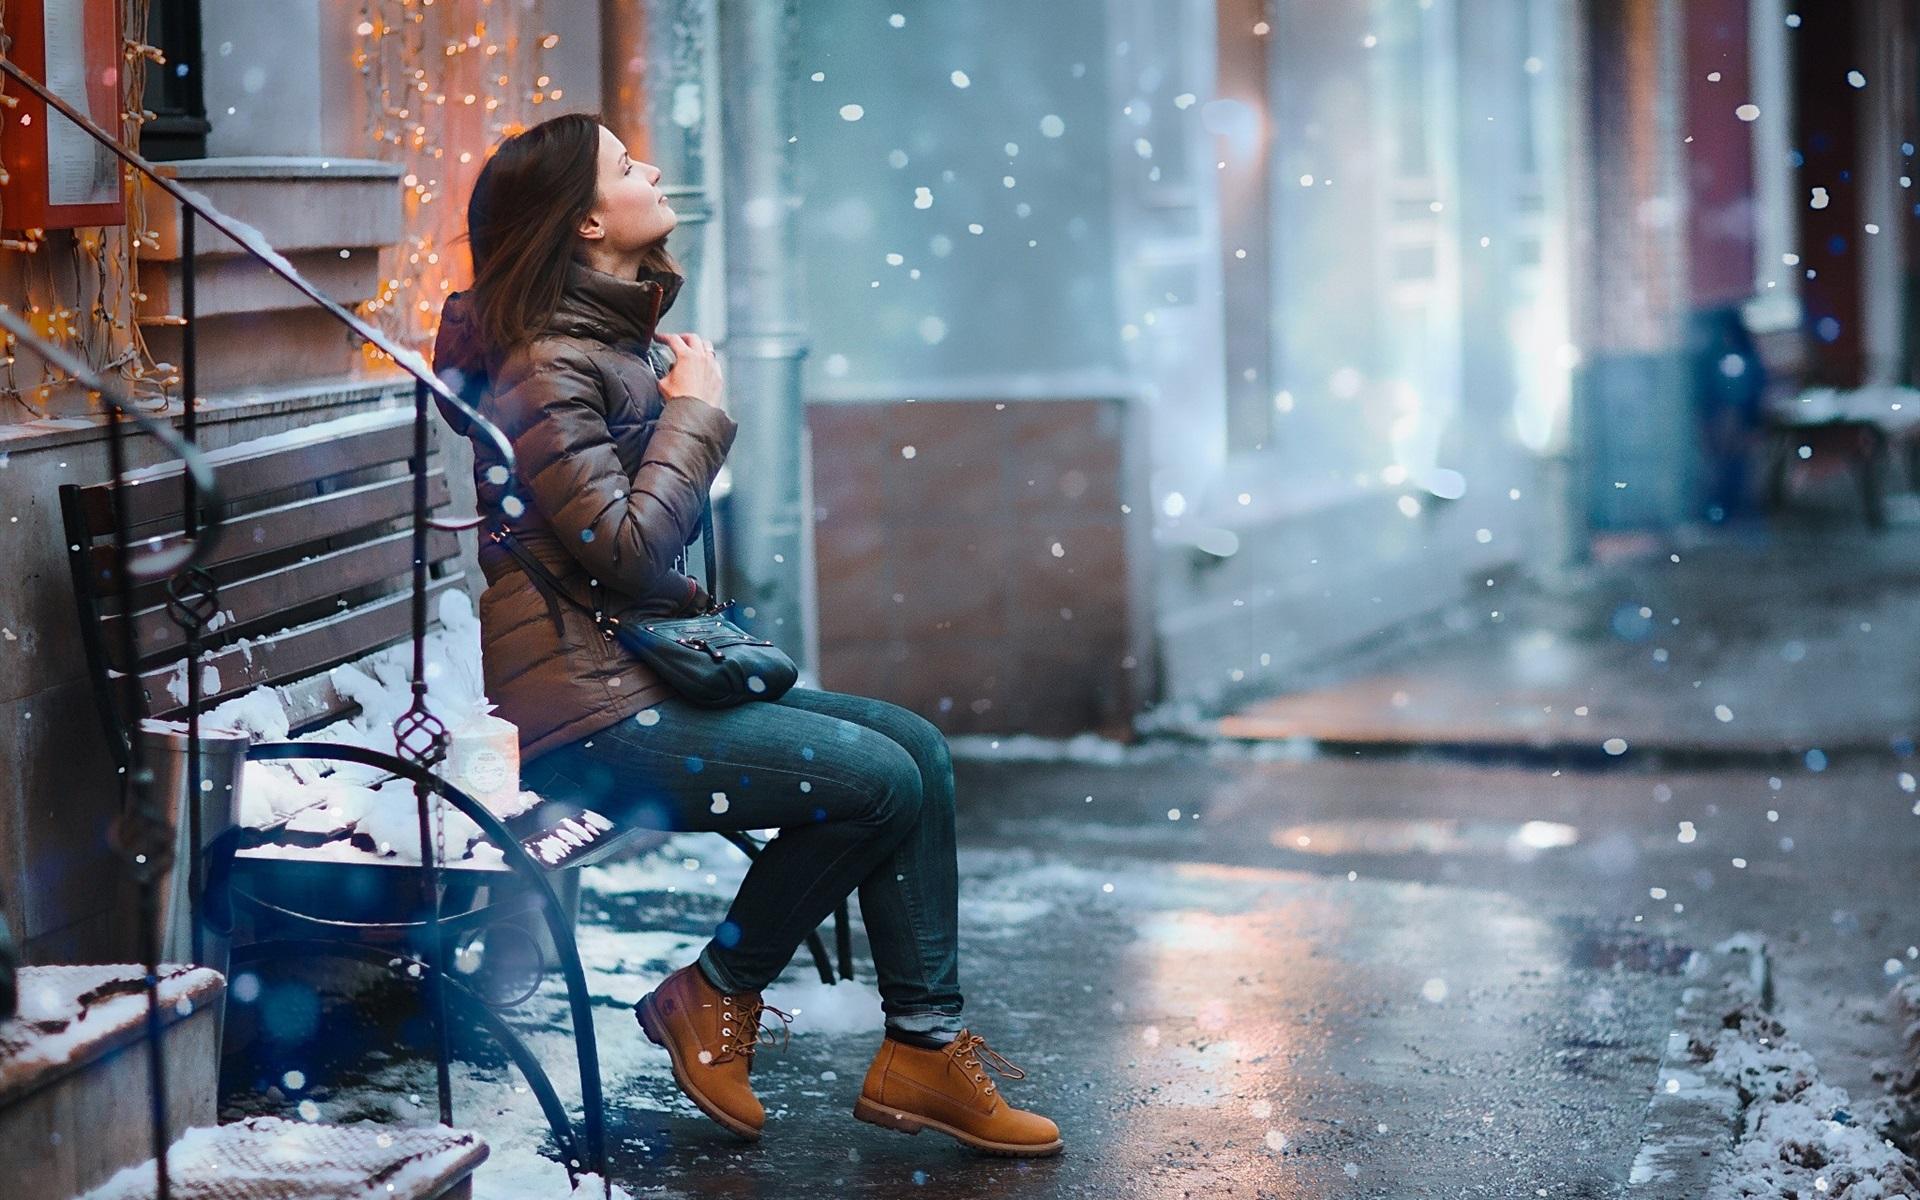 Картинка девушка вечер зима